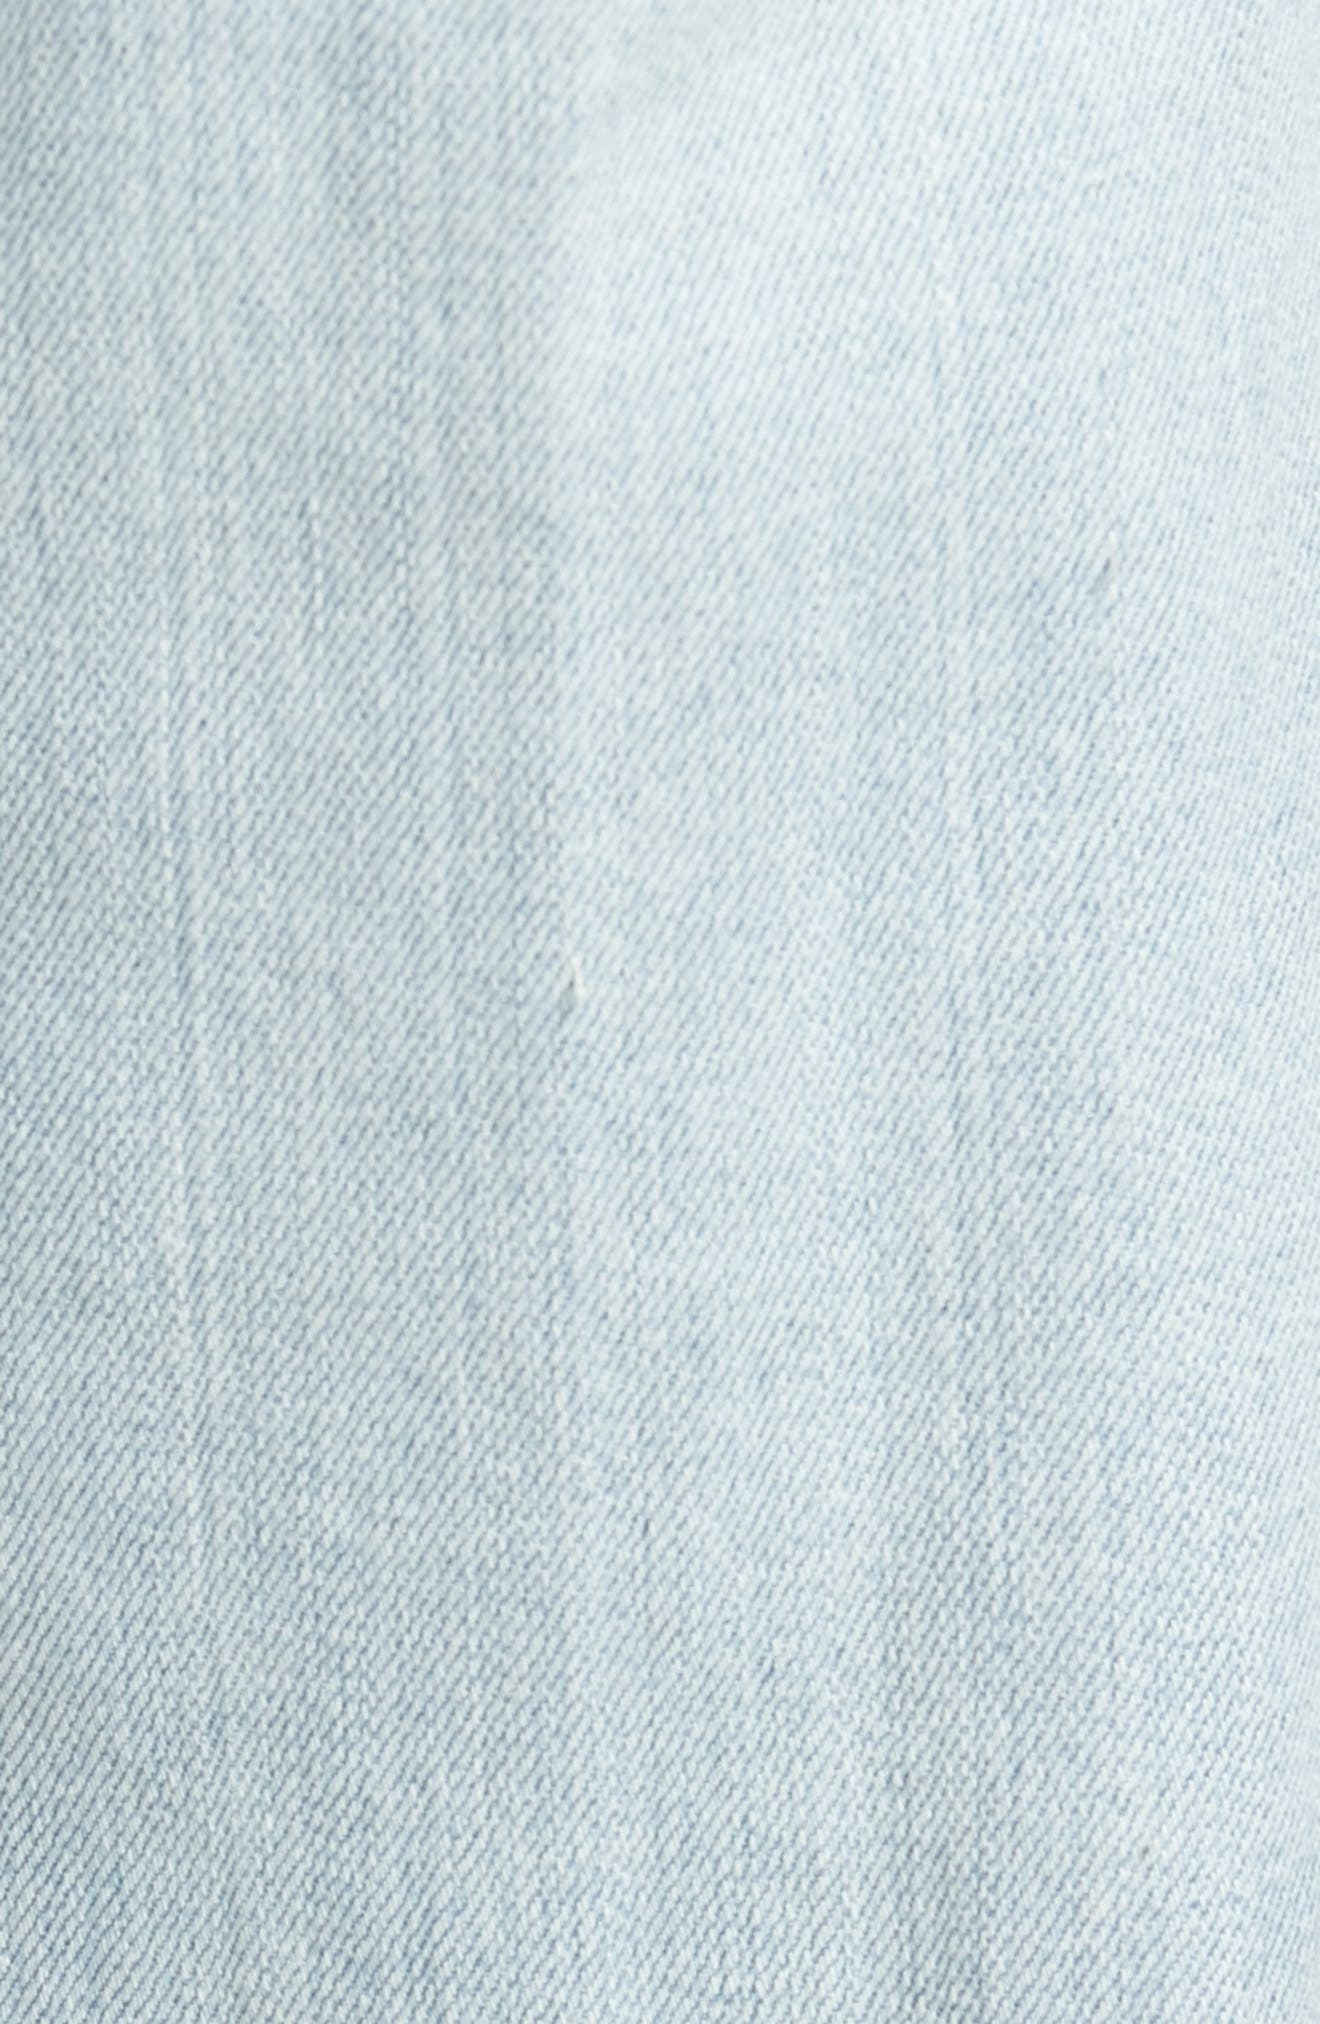 Graduate Slim Straight Leg Jeans,                             Alternate thumbnail 5, color,                             400